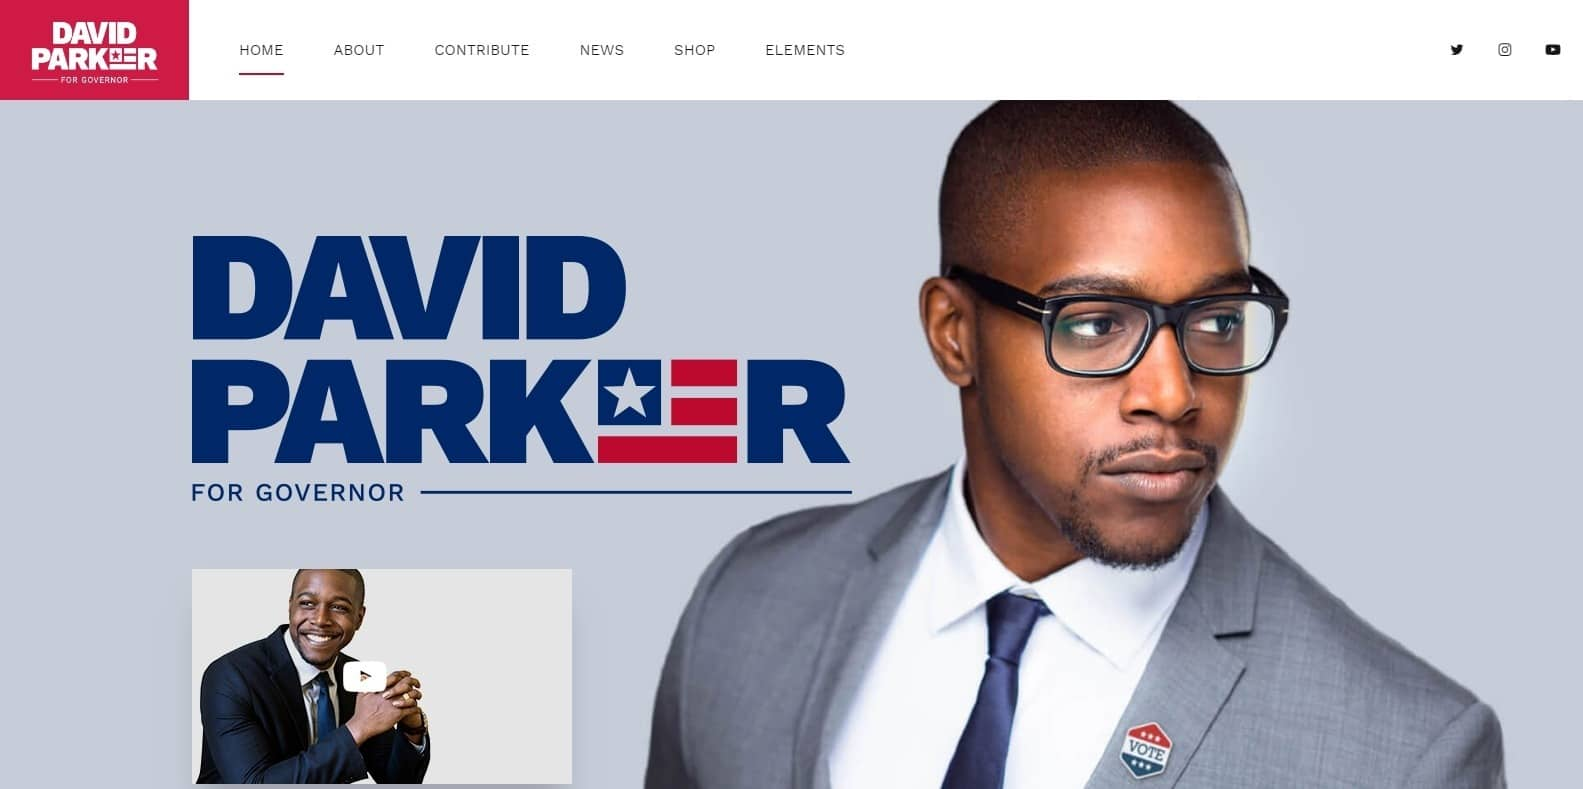 vox-populi-political-website-template